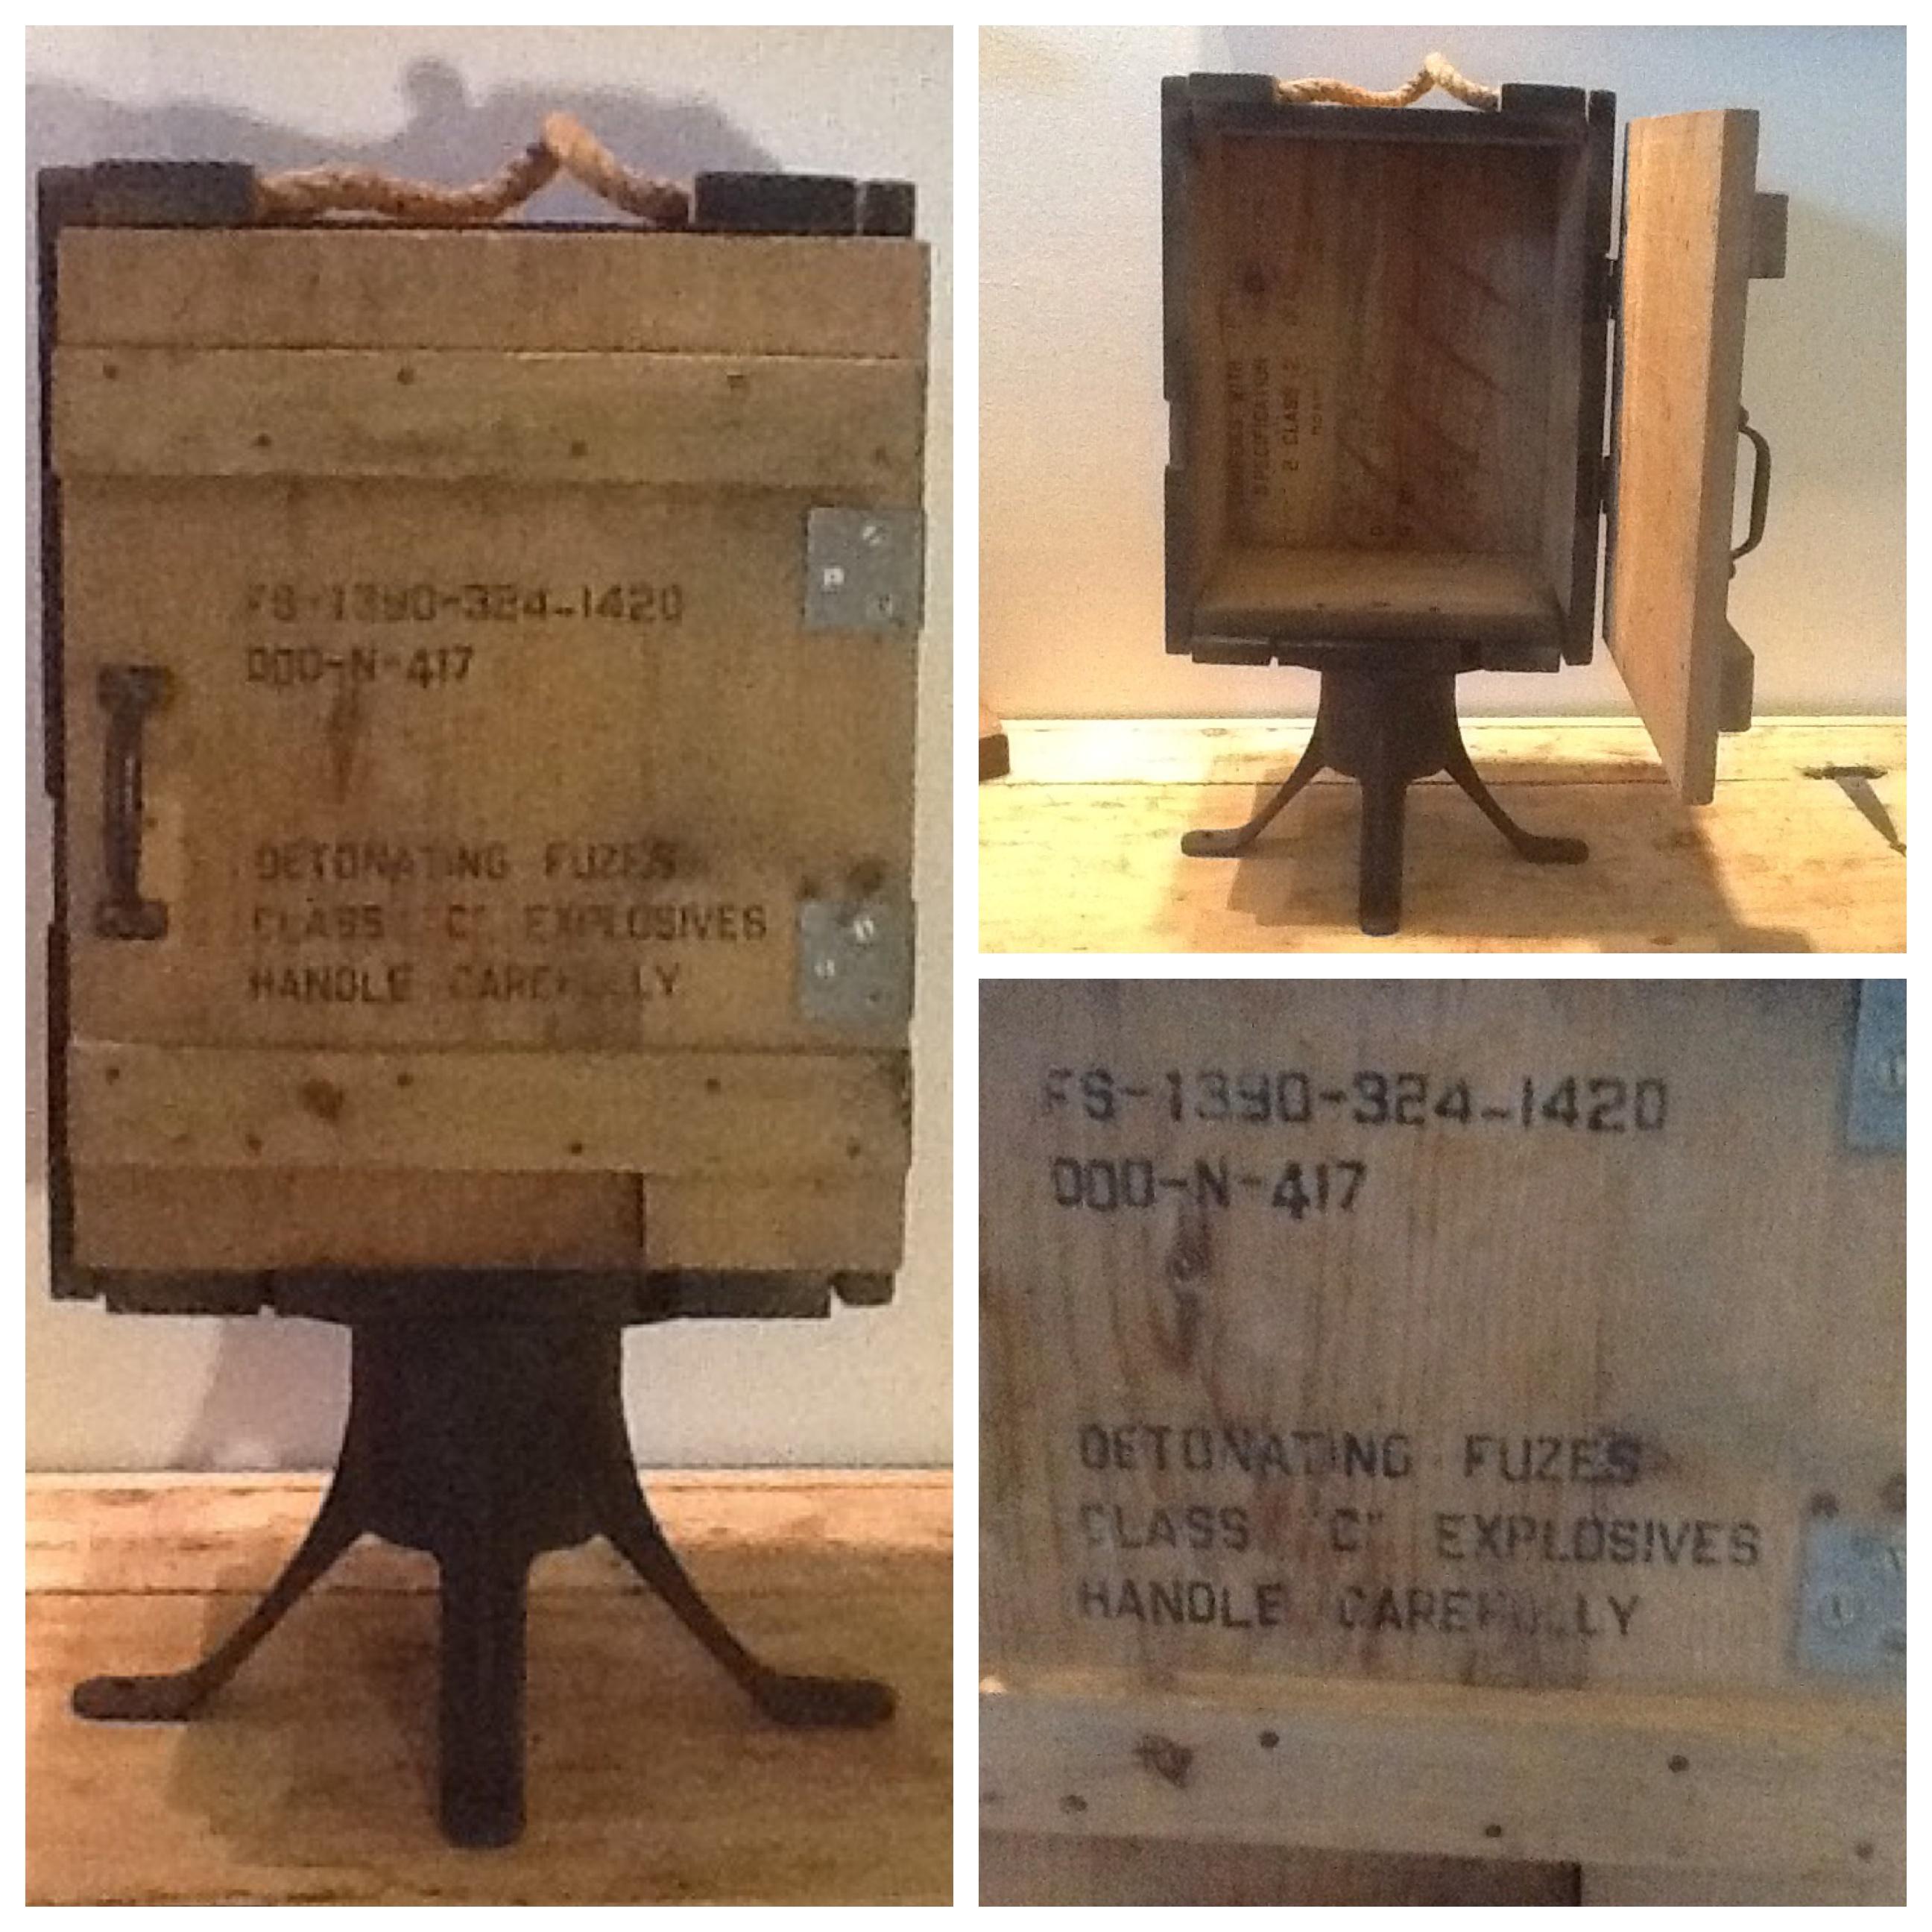 Man Cave Storage Moorabbin : Vintage ice chests antique treasures new beginnings by